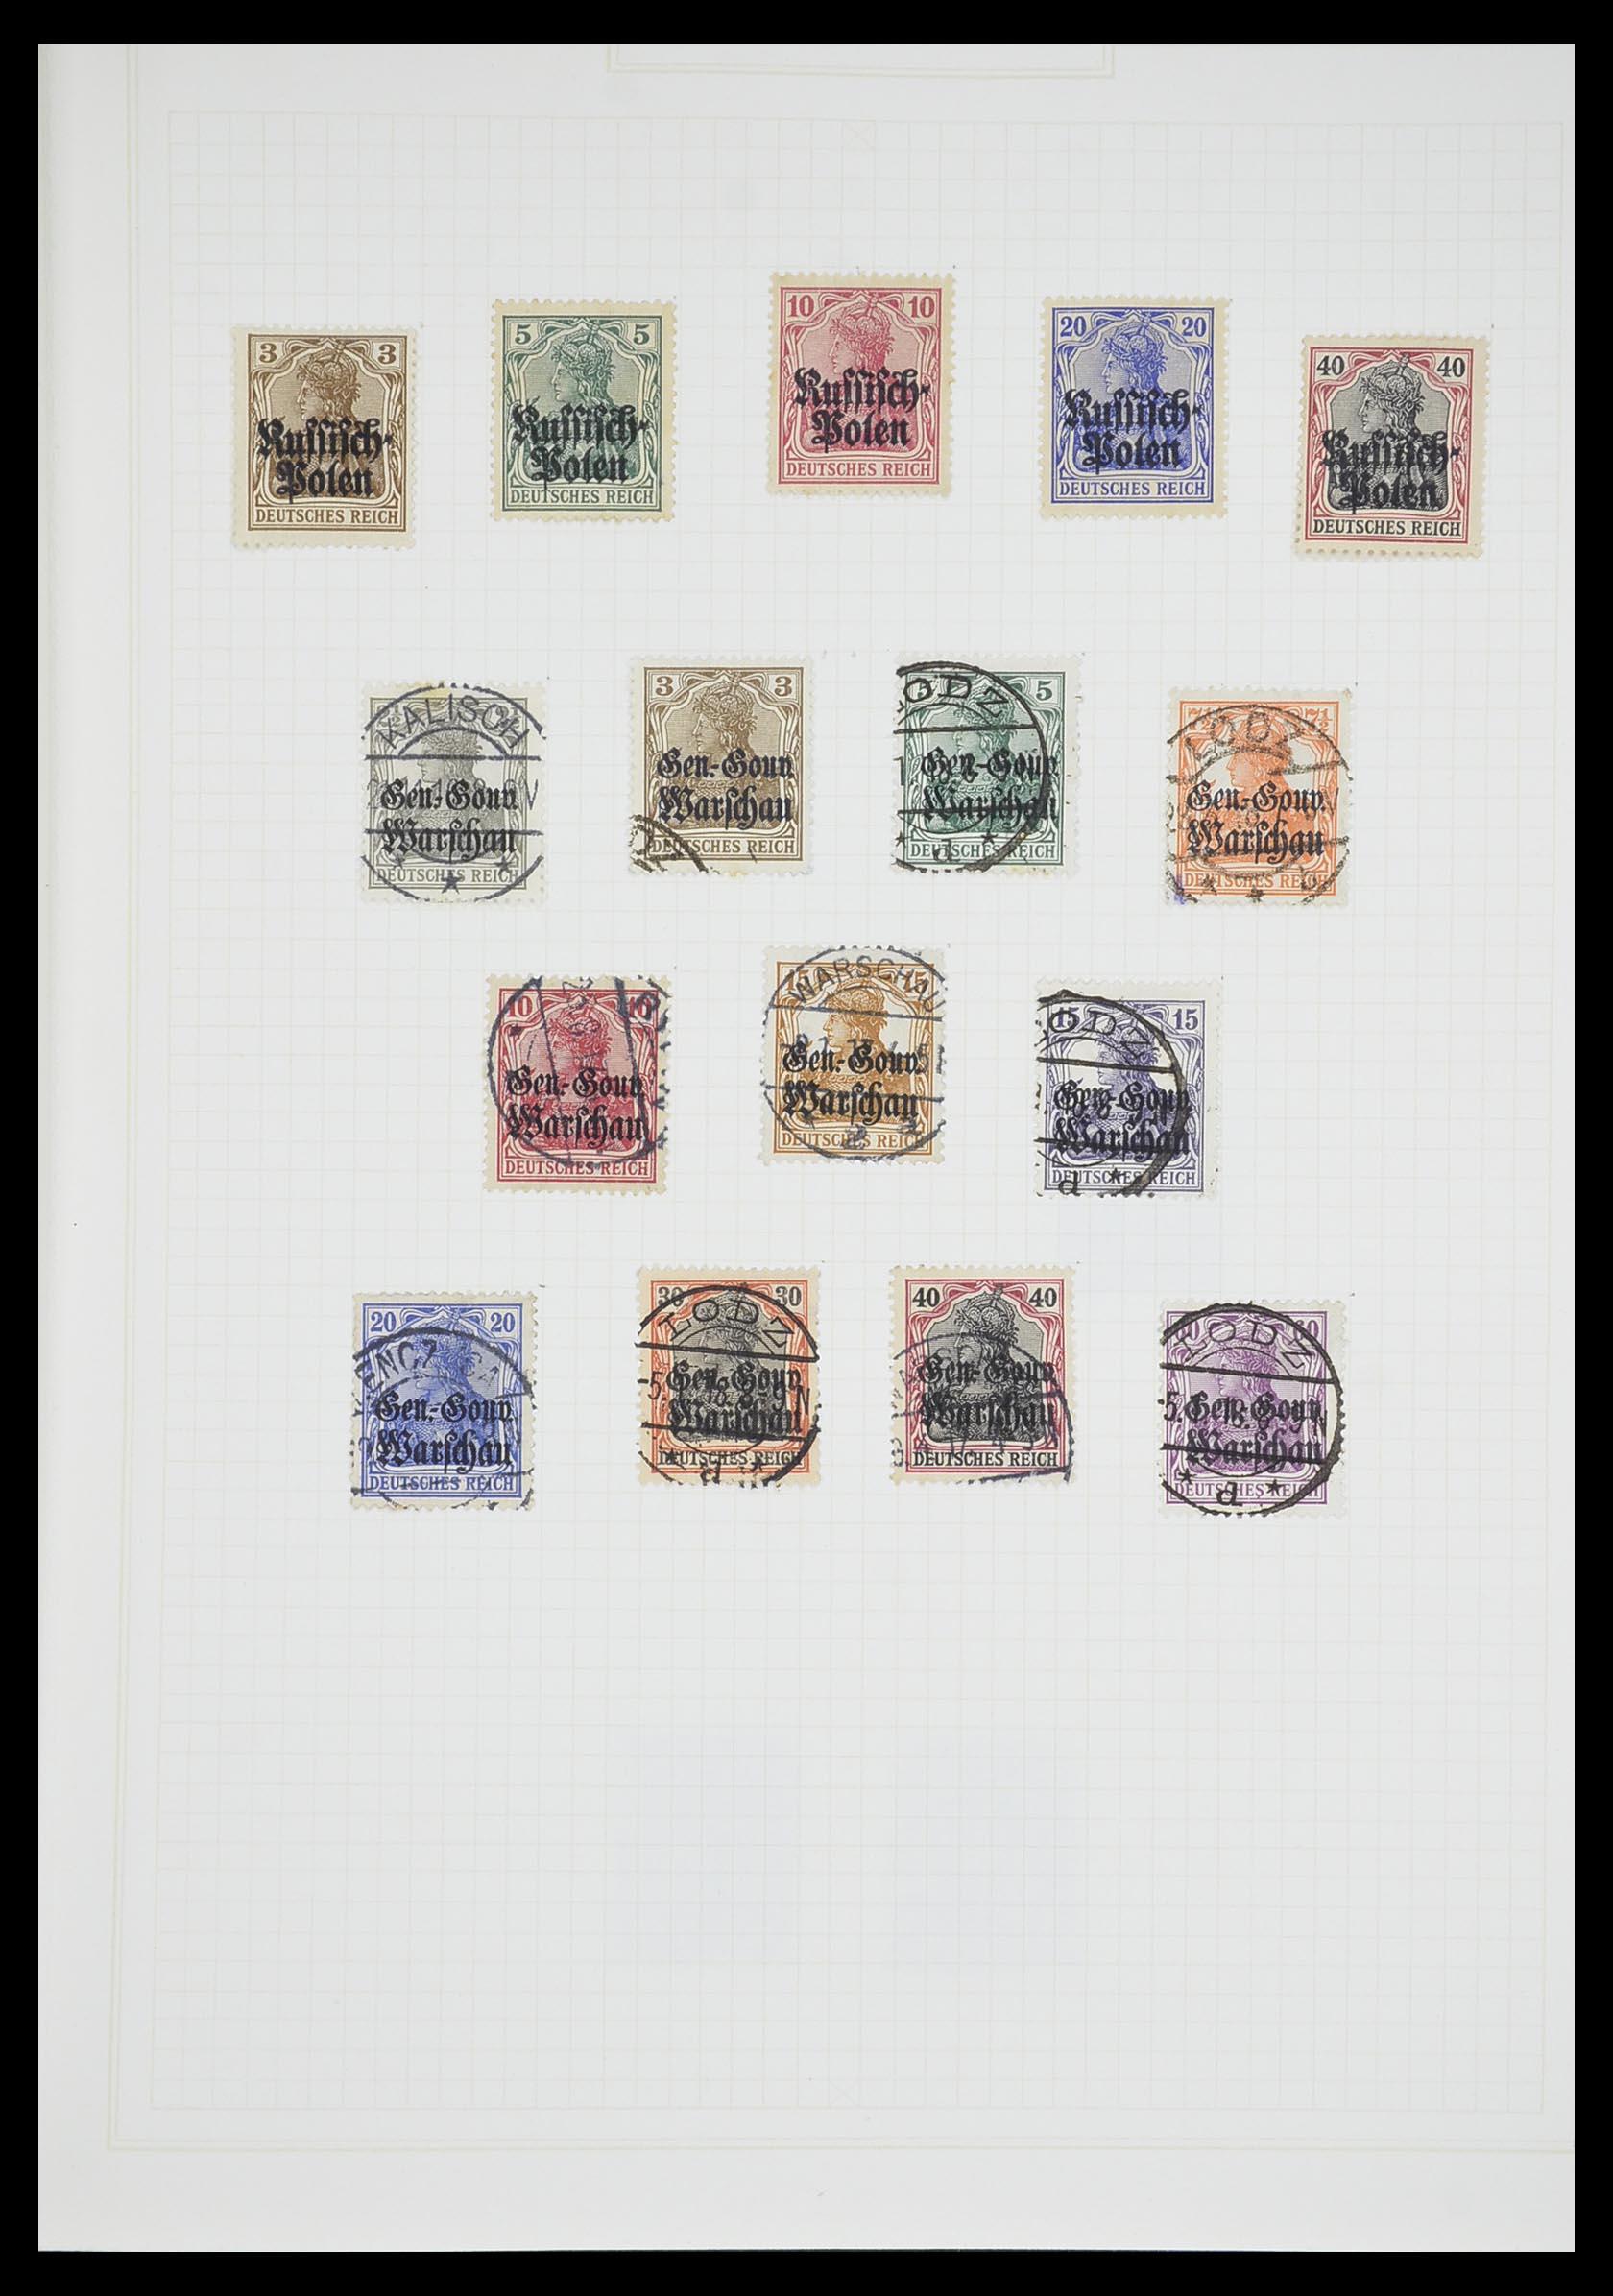 33713 005 - Postzegelverzameling 33713 Duitse bezettingen WO I en WO II 1914-1945